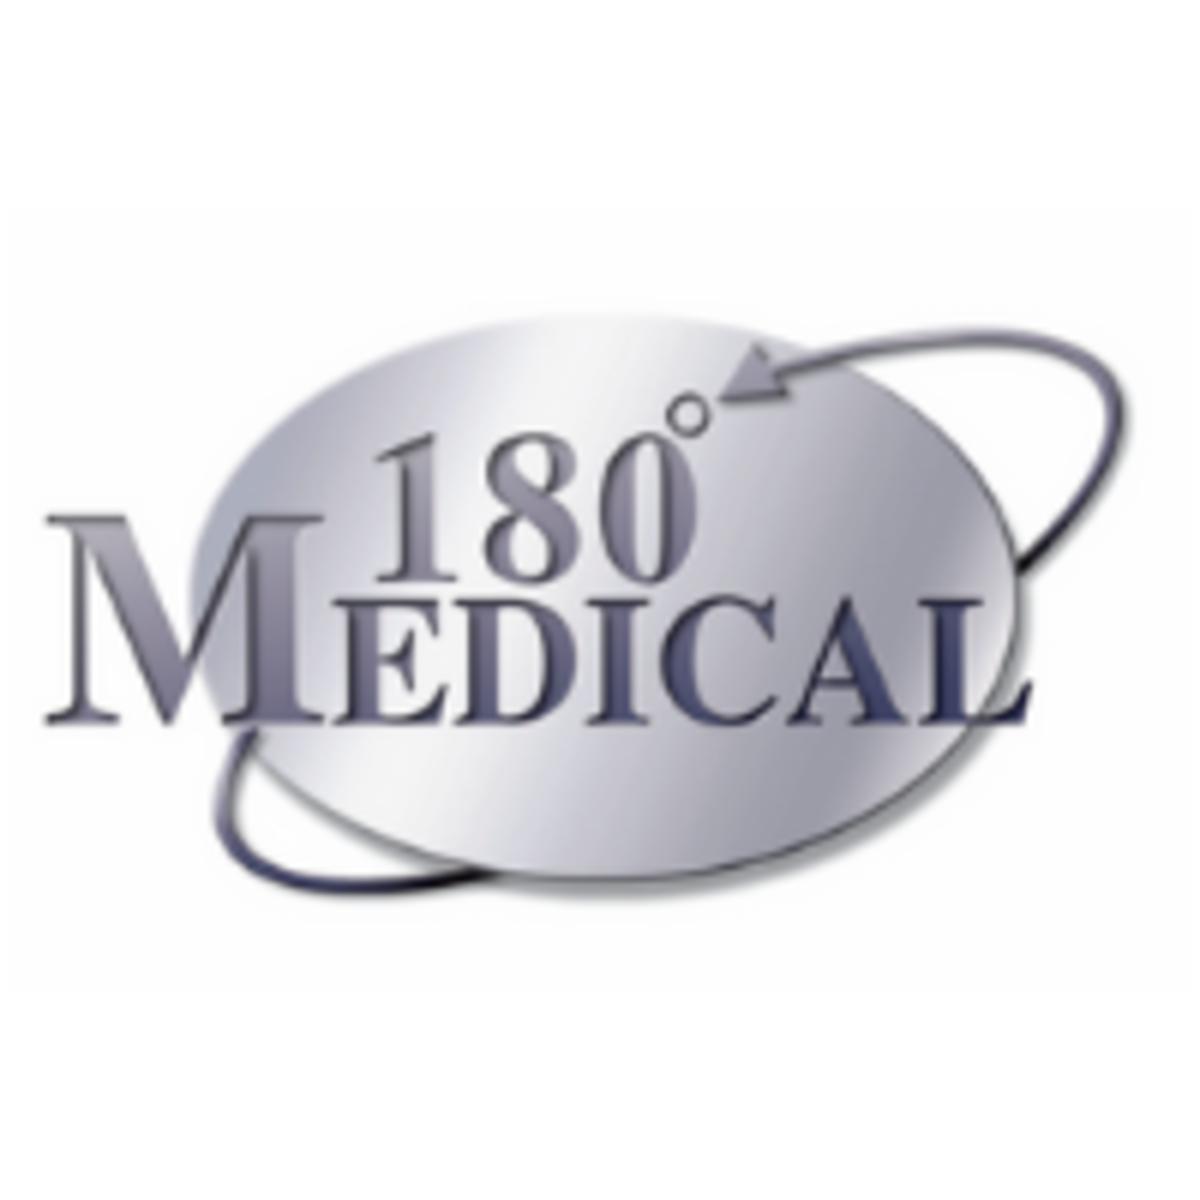 180 Medical logo